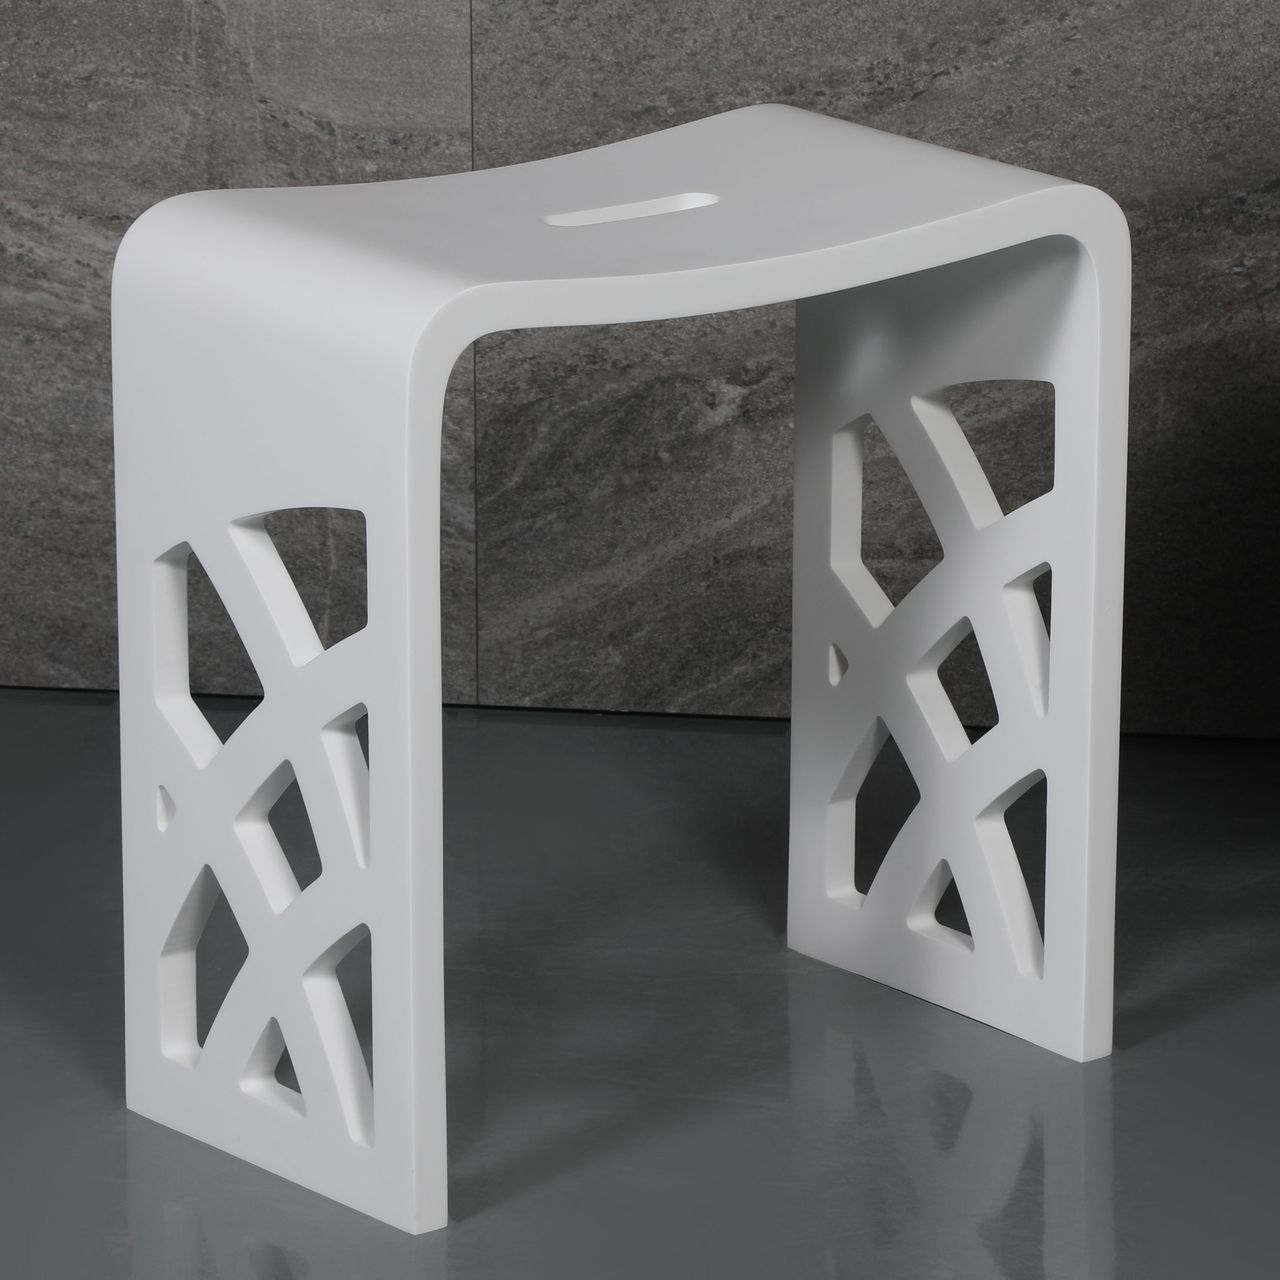 ALFI Designer White Matte Solid Surface Resin Bathroom / Shower Stool